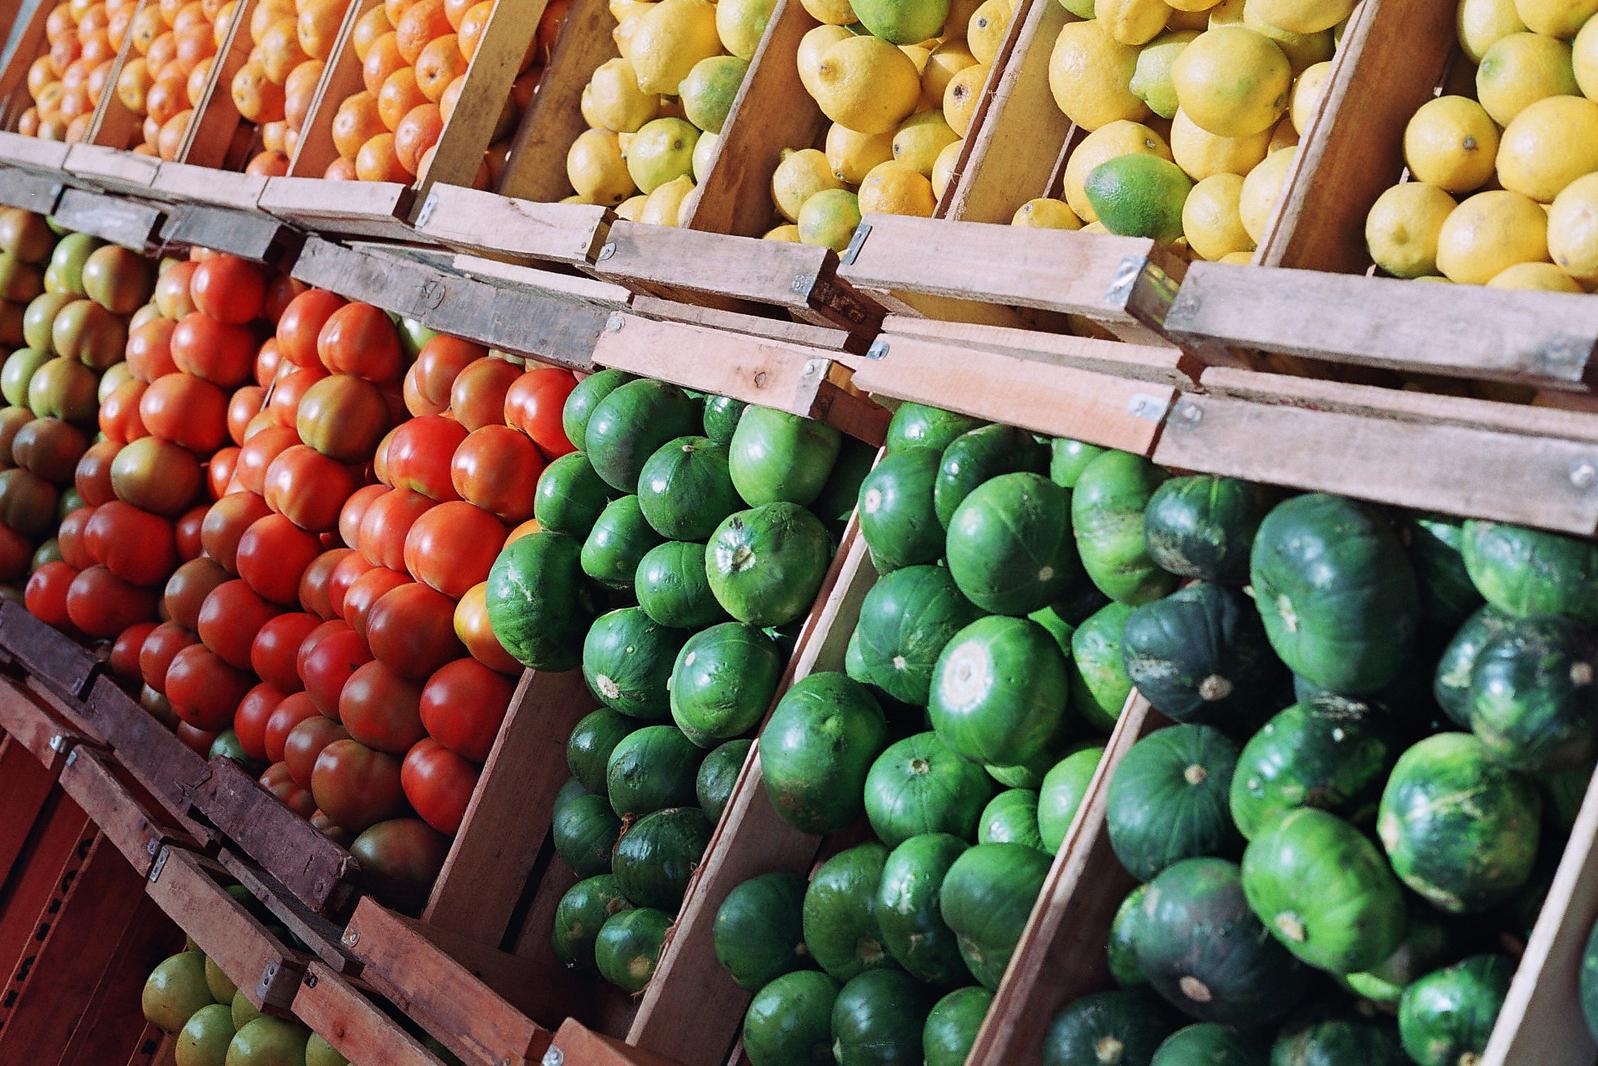 color-fruits-1315690-1598x1065.jpg